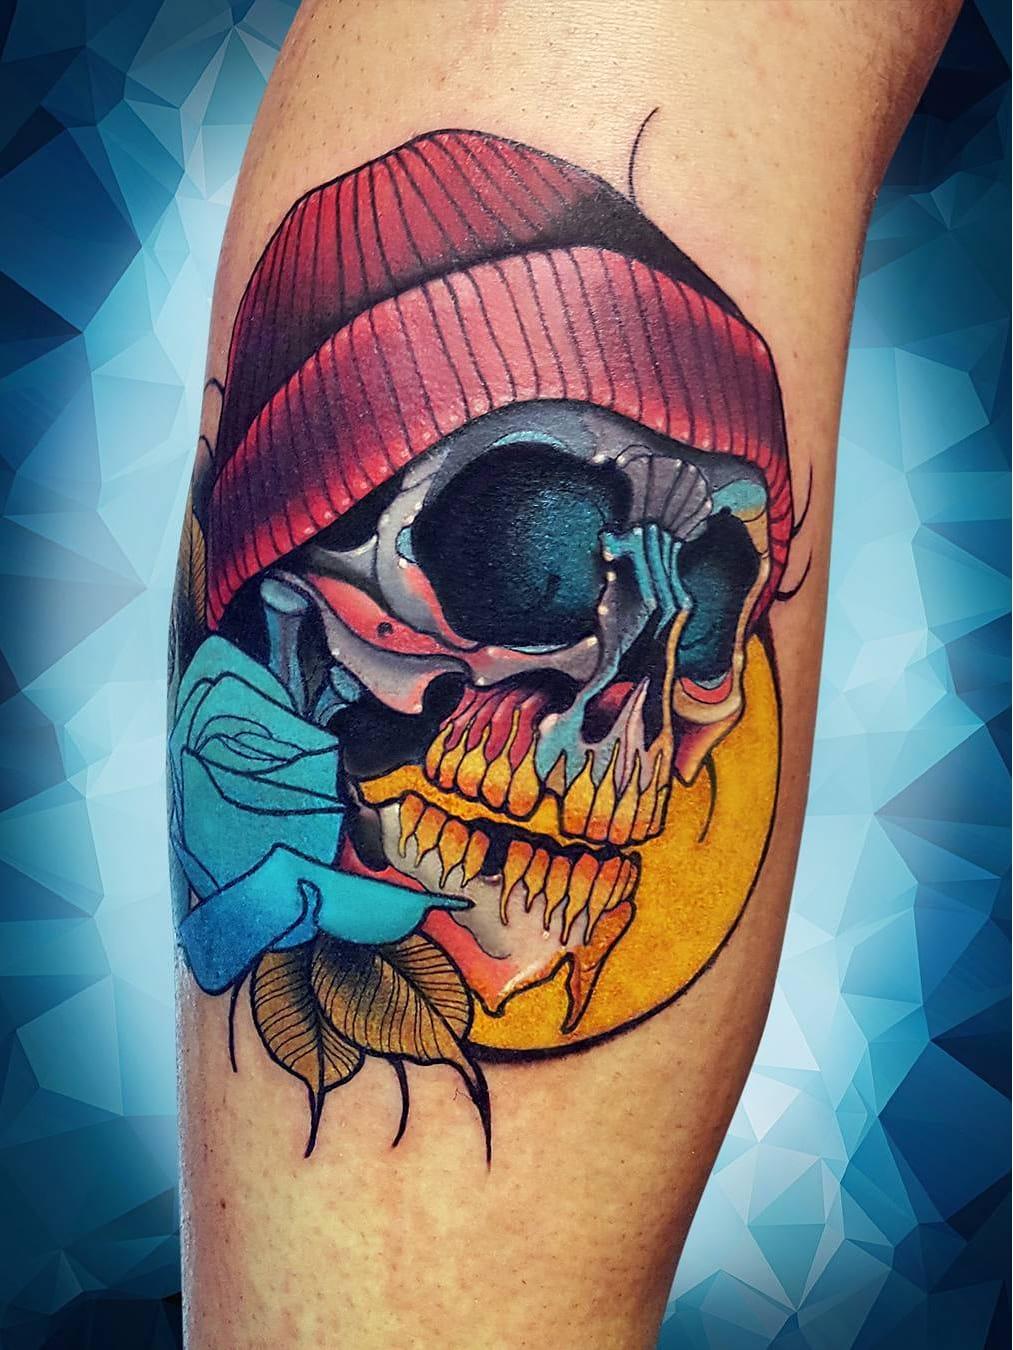 #NiktheRookie #gringo #neotraditional #neotrad #colorido #colorful #skull #caveira #cranio #flor #flower #rose #rosa #folha #leaf